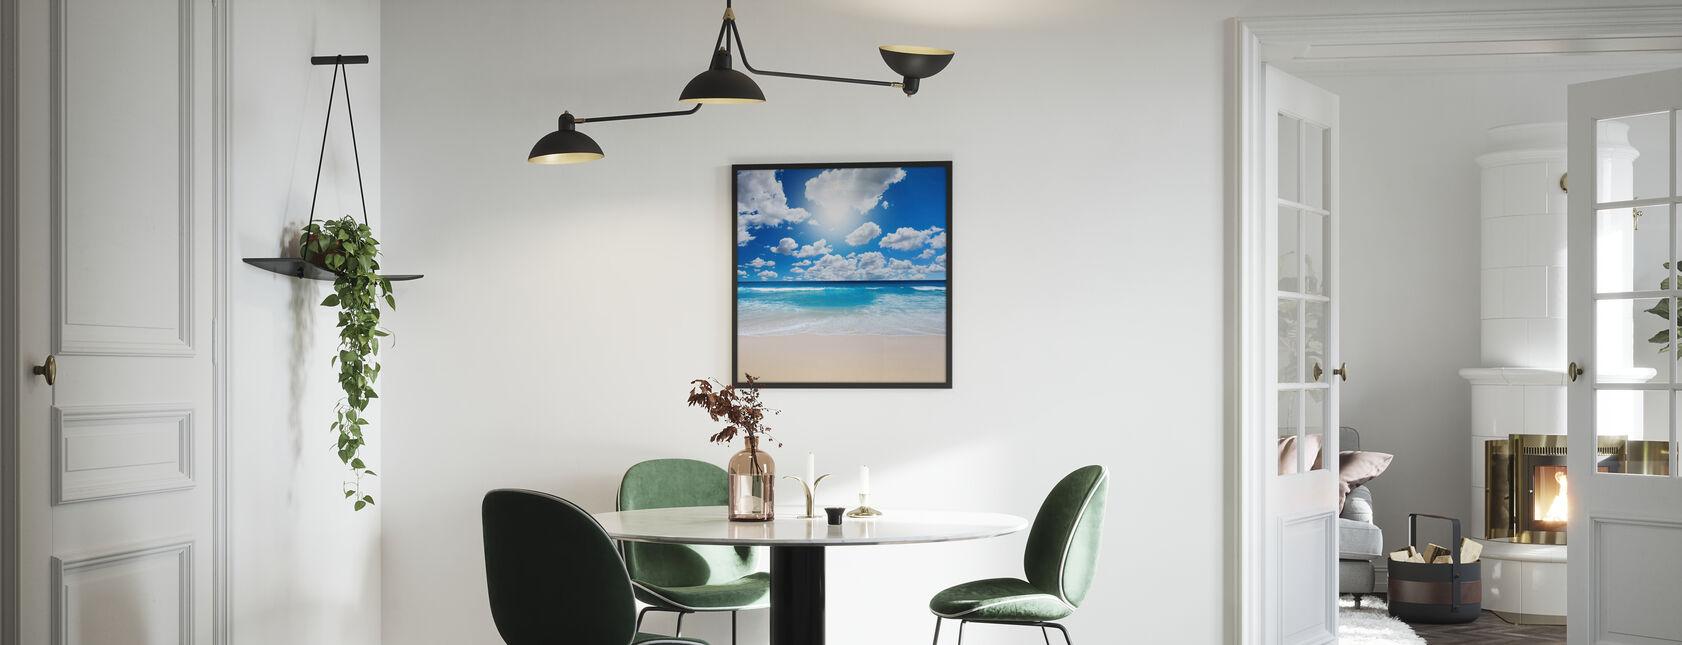 Estate in spiaggia - Stampa incorniciata - Cucina